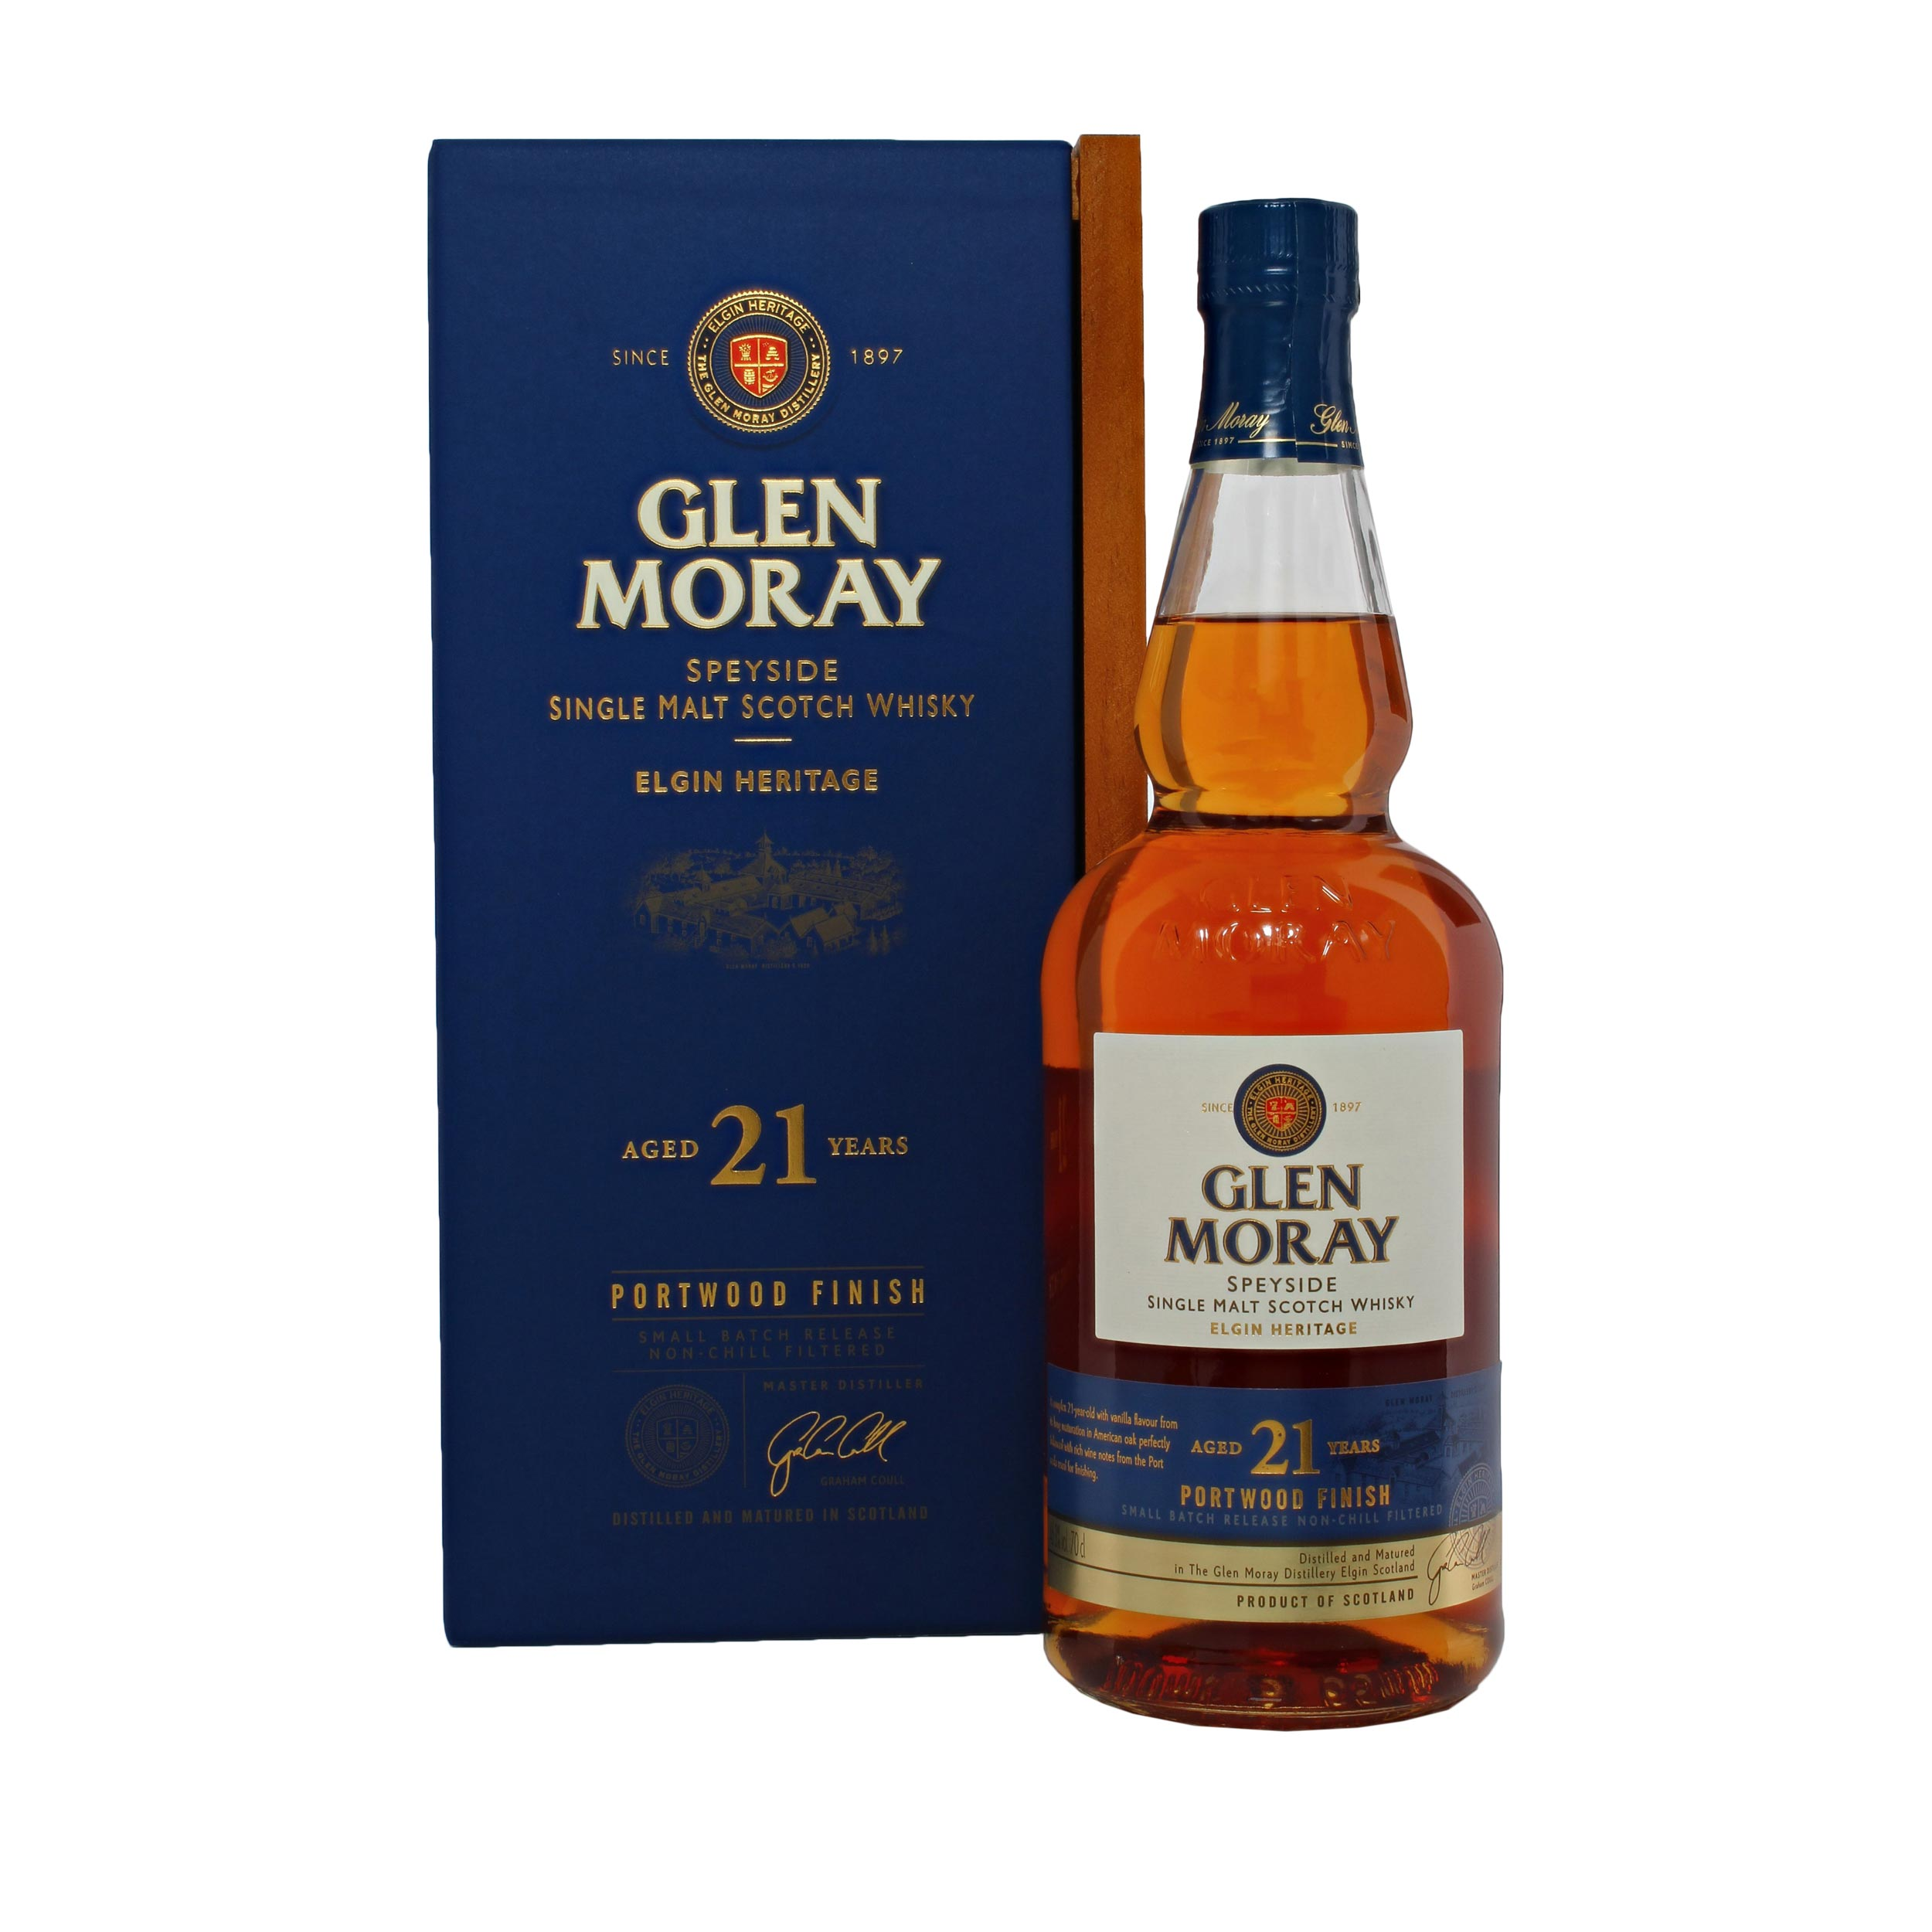 Glen Moray 21 Year Old